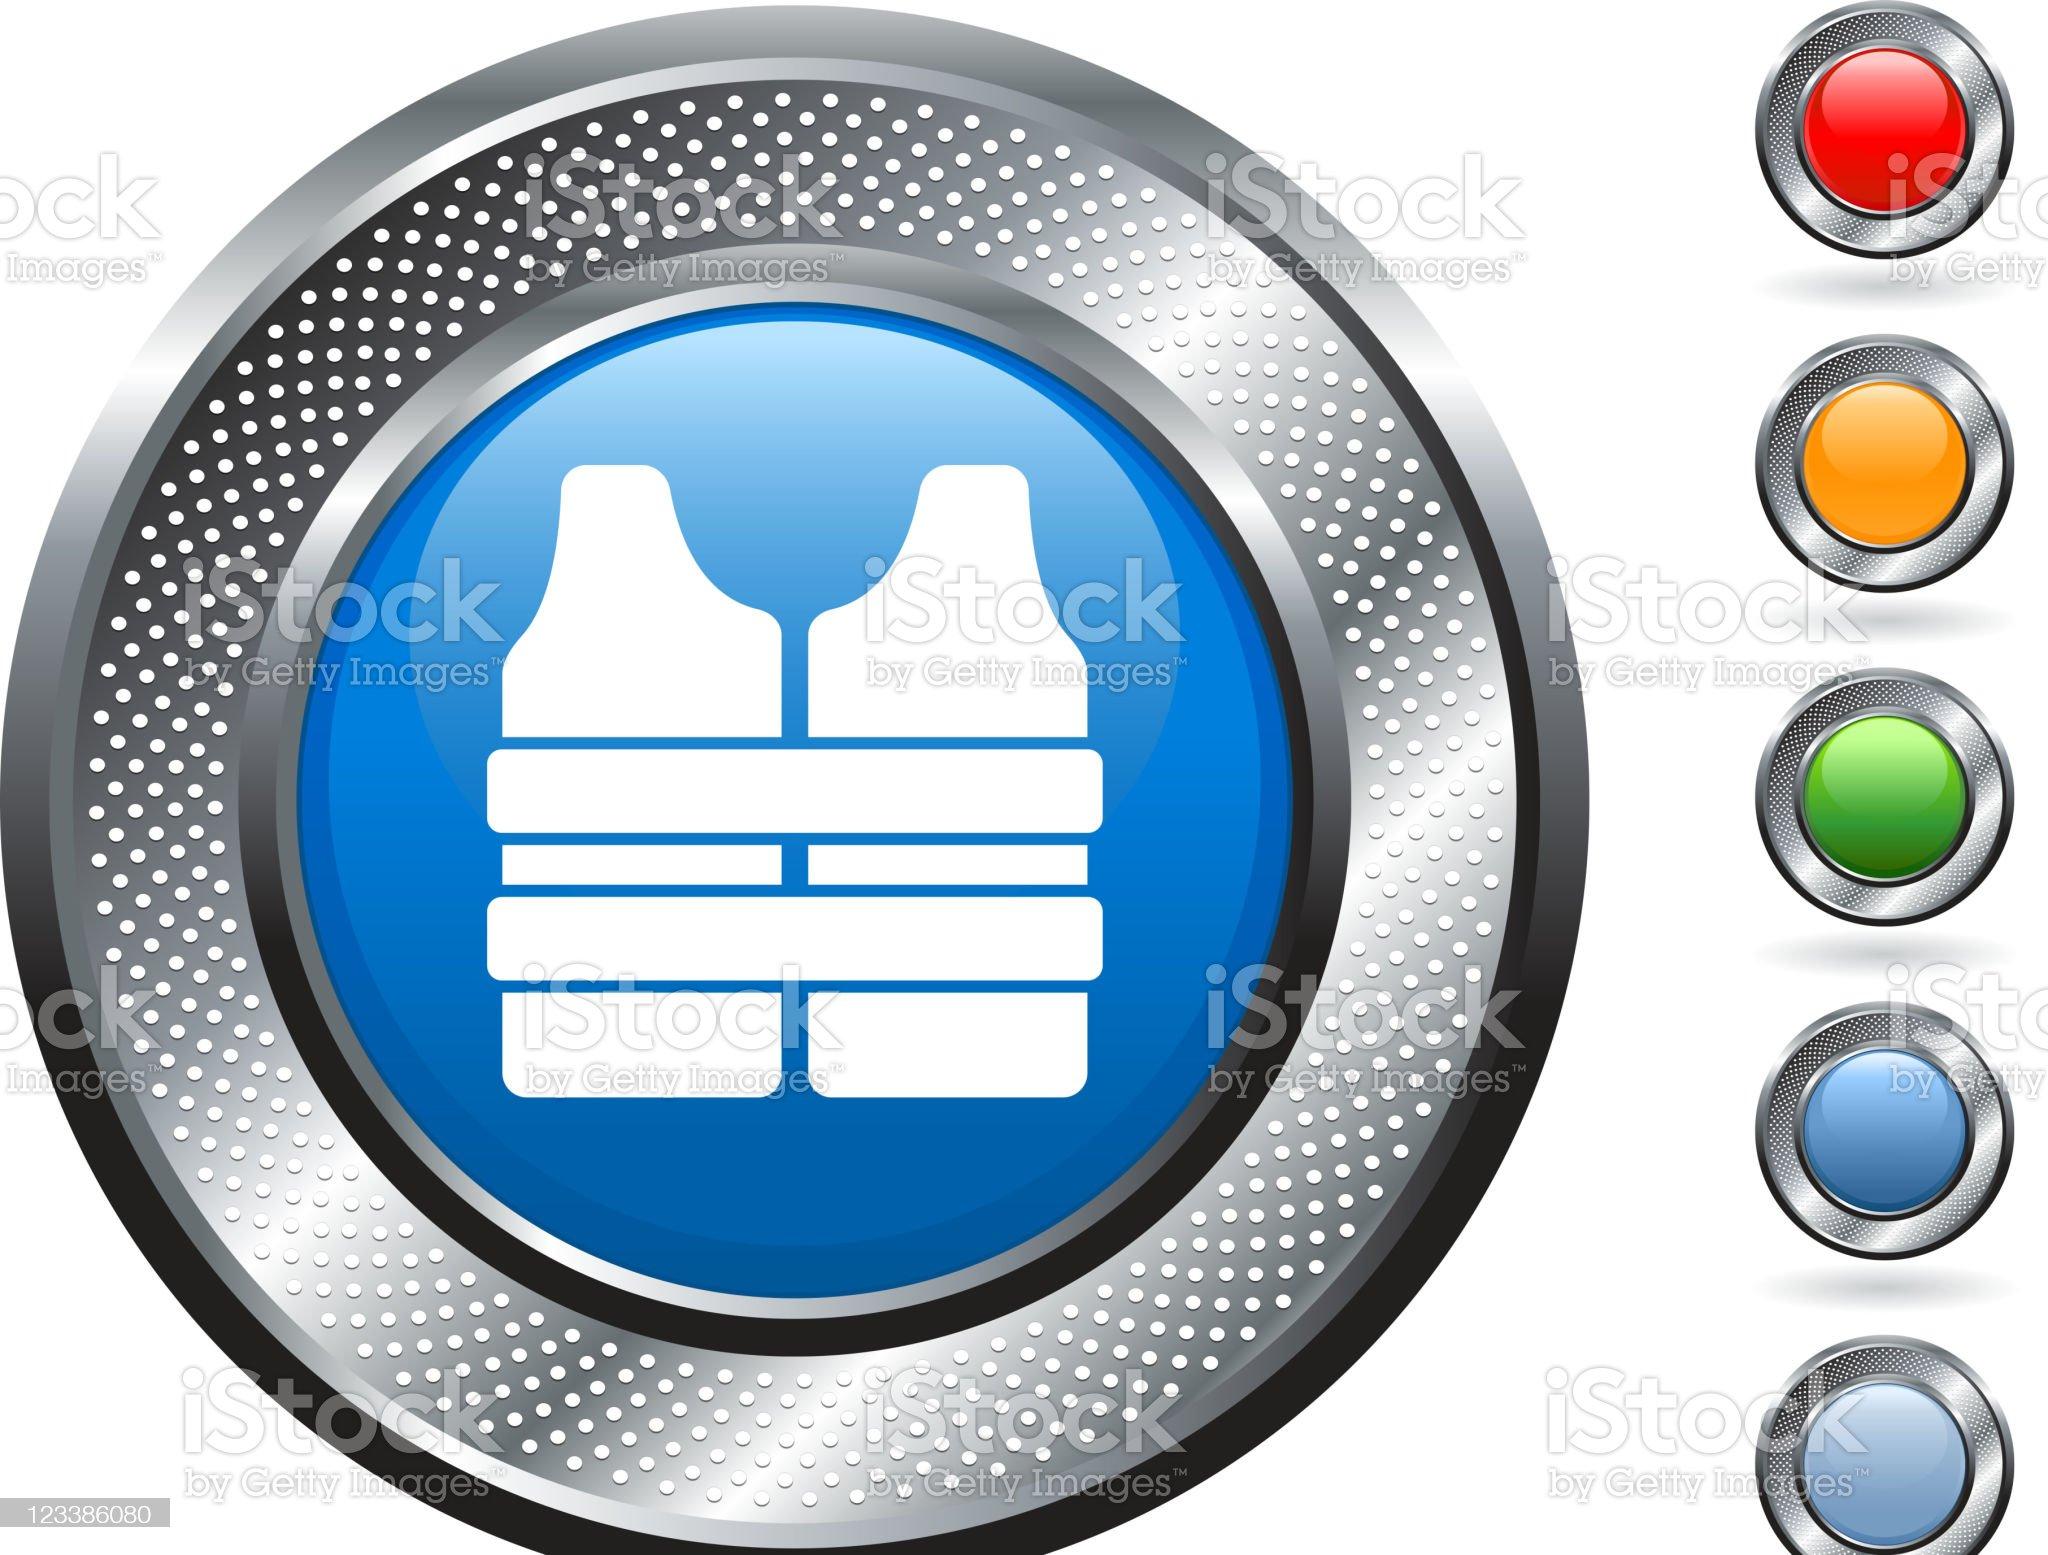 life vest royalty free vector art on metallic button royalty-free stock vector art